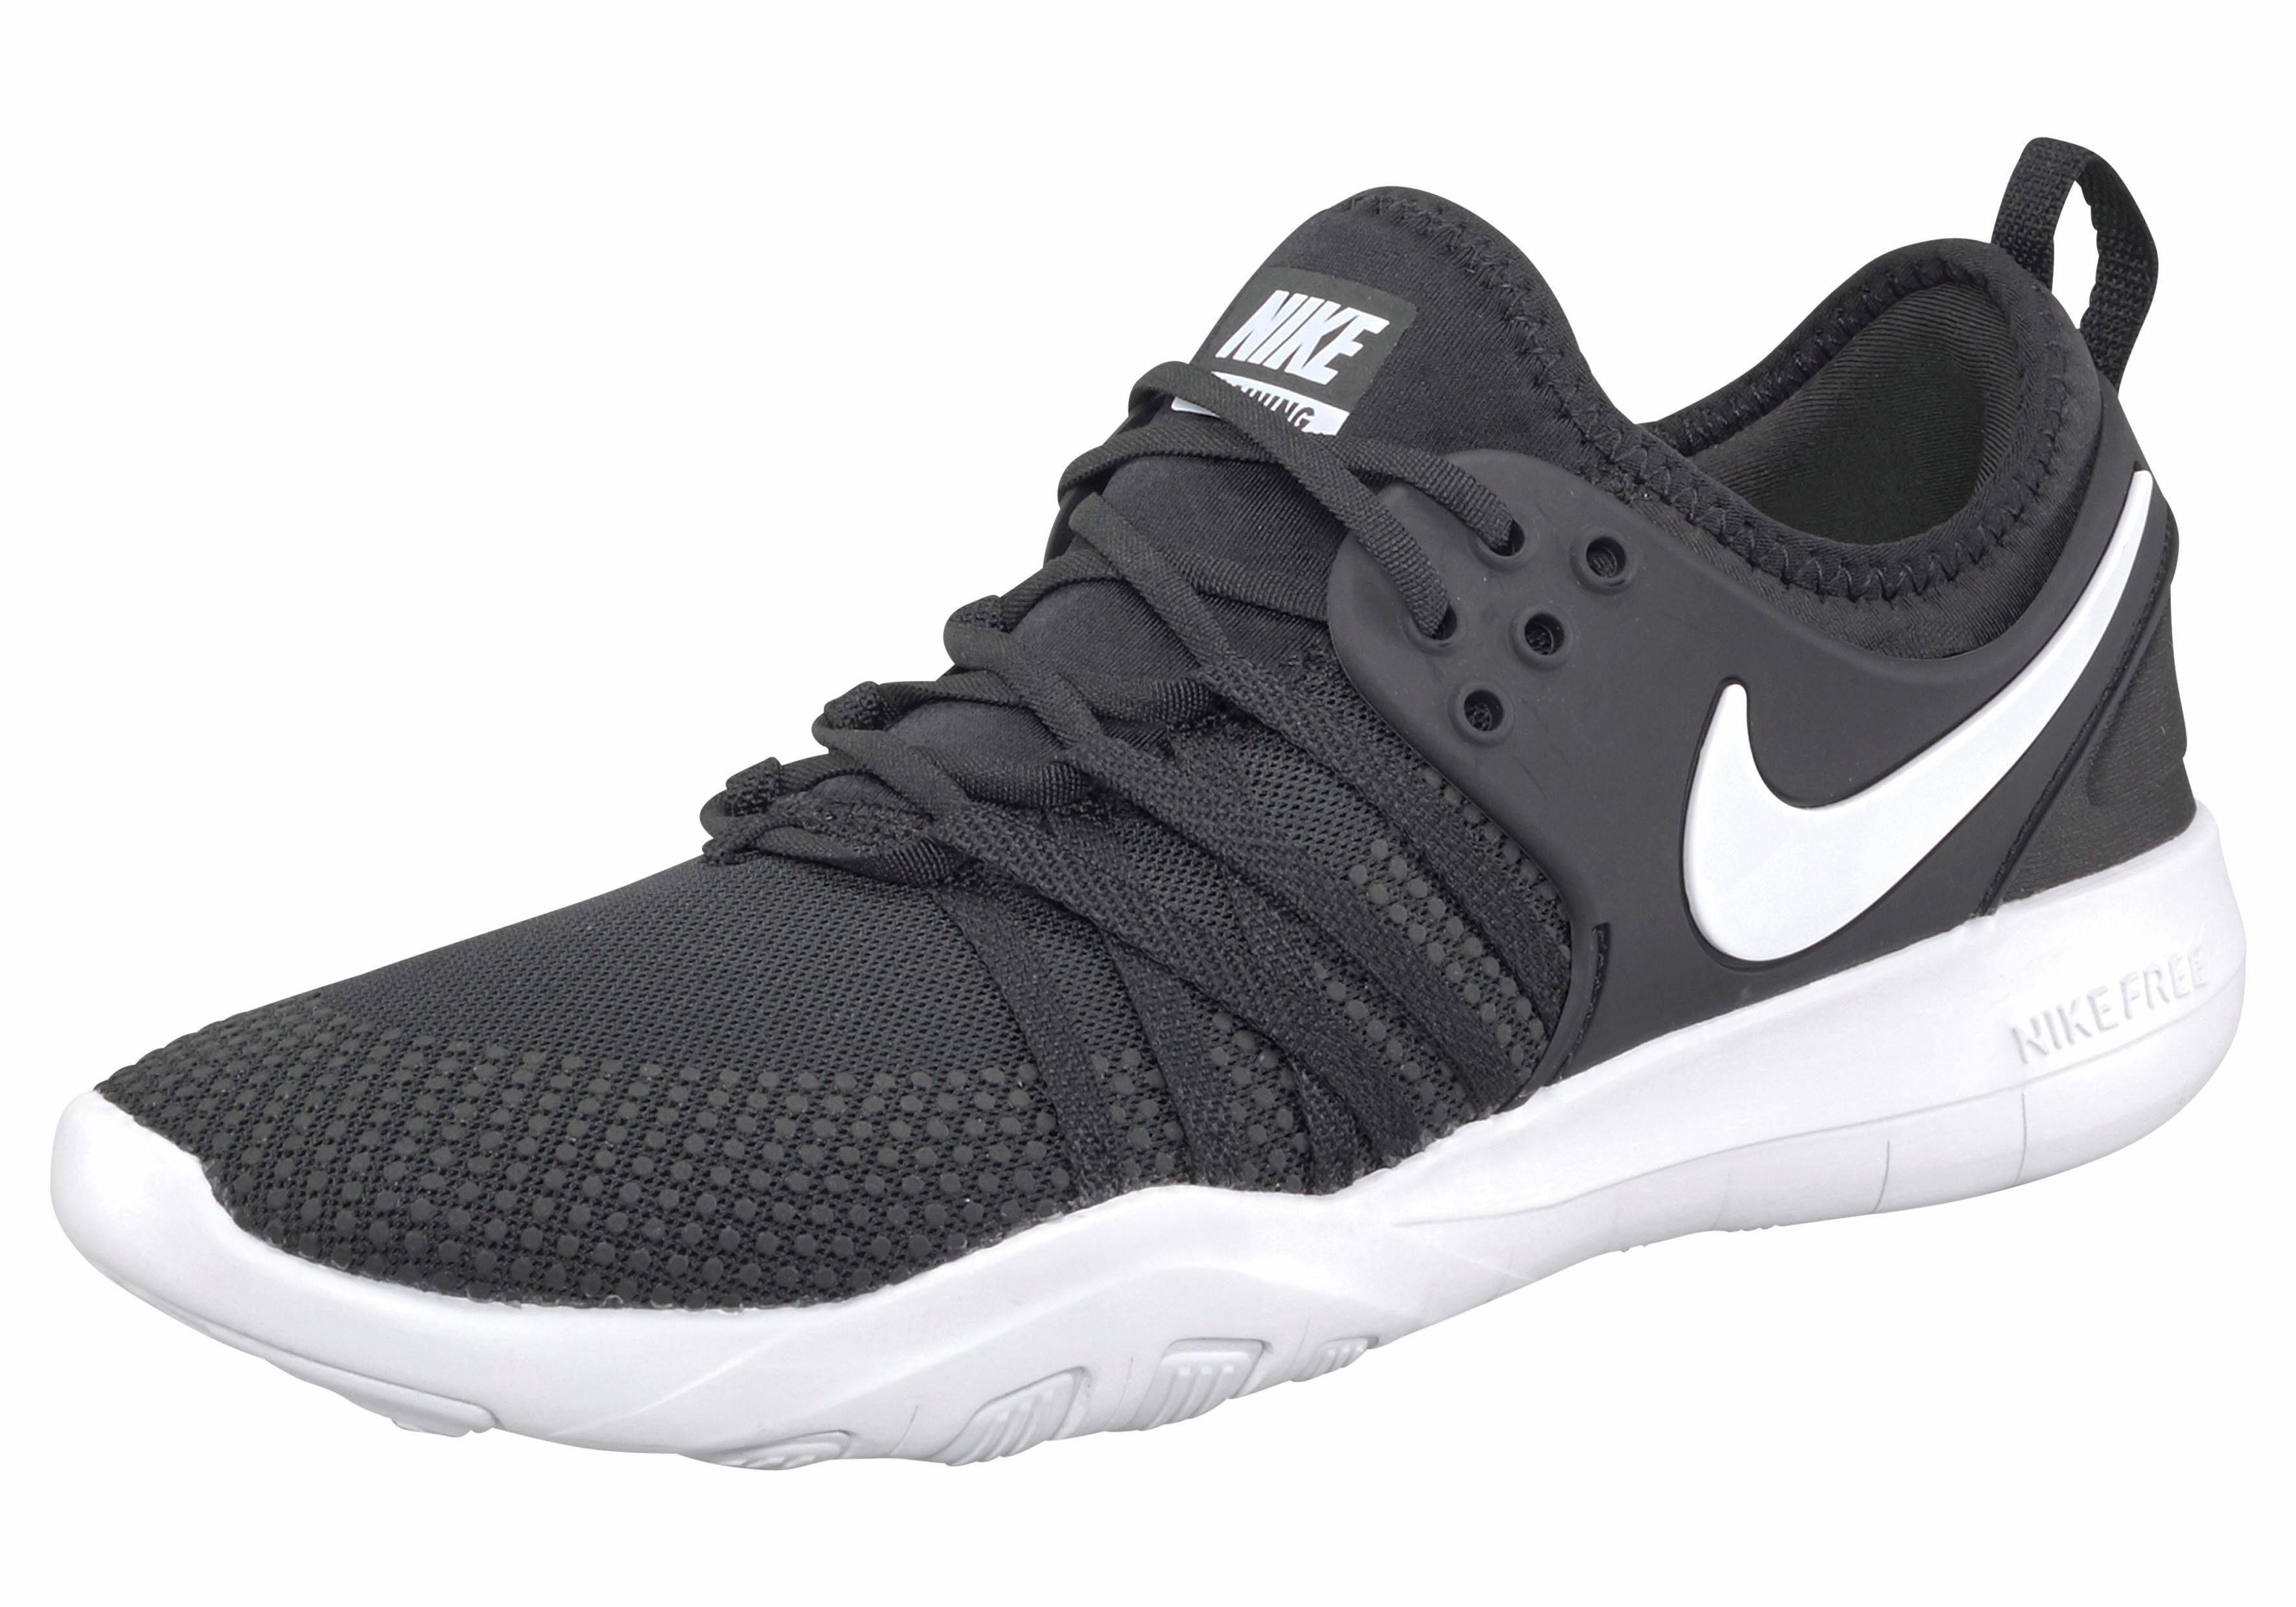 Nike - Agilité Ajustement Air Zoom 2 Fitnesschoenen - Femmes - Chaussures - Bleu - 38 yMb24